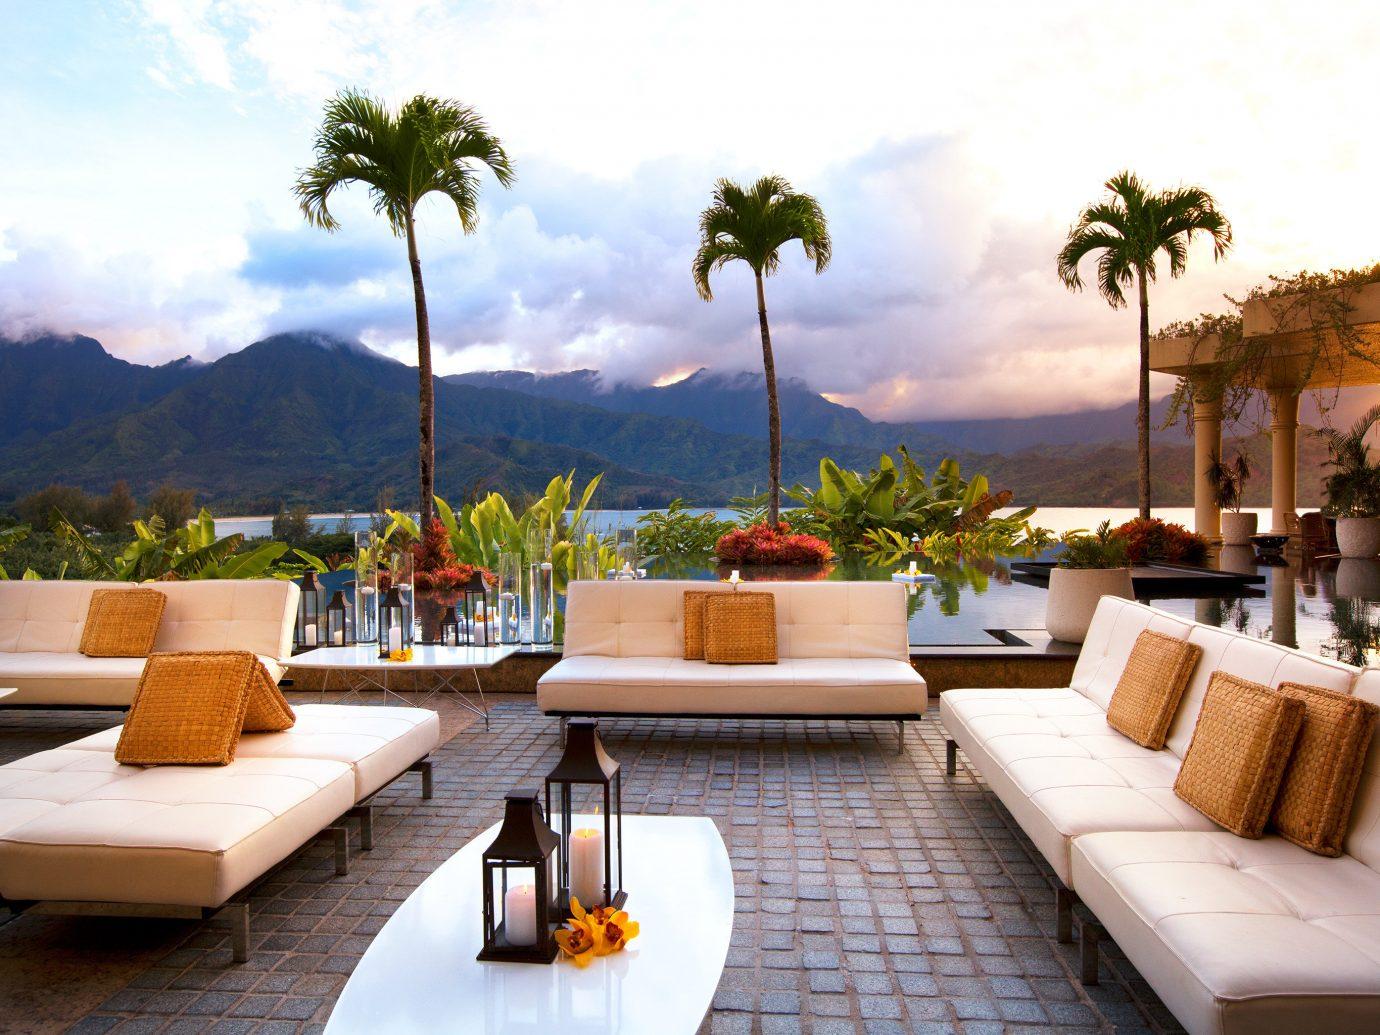 St Regis Outdoor Patio At The Princeville Resort In Kauai